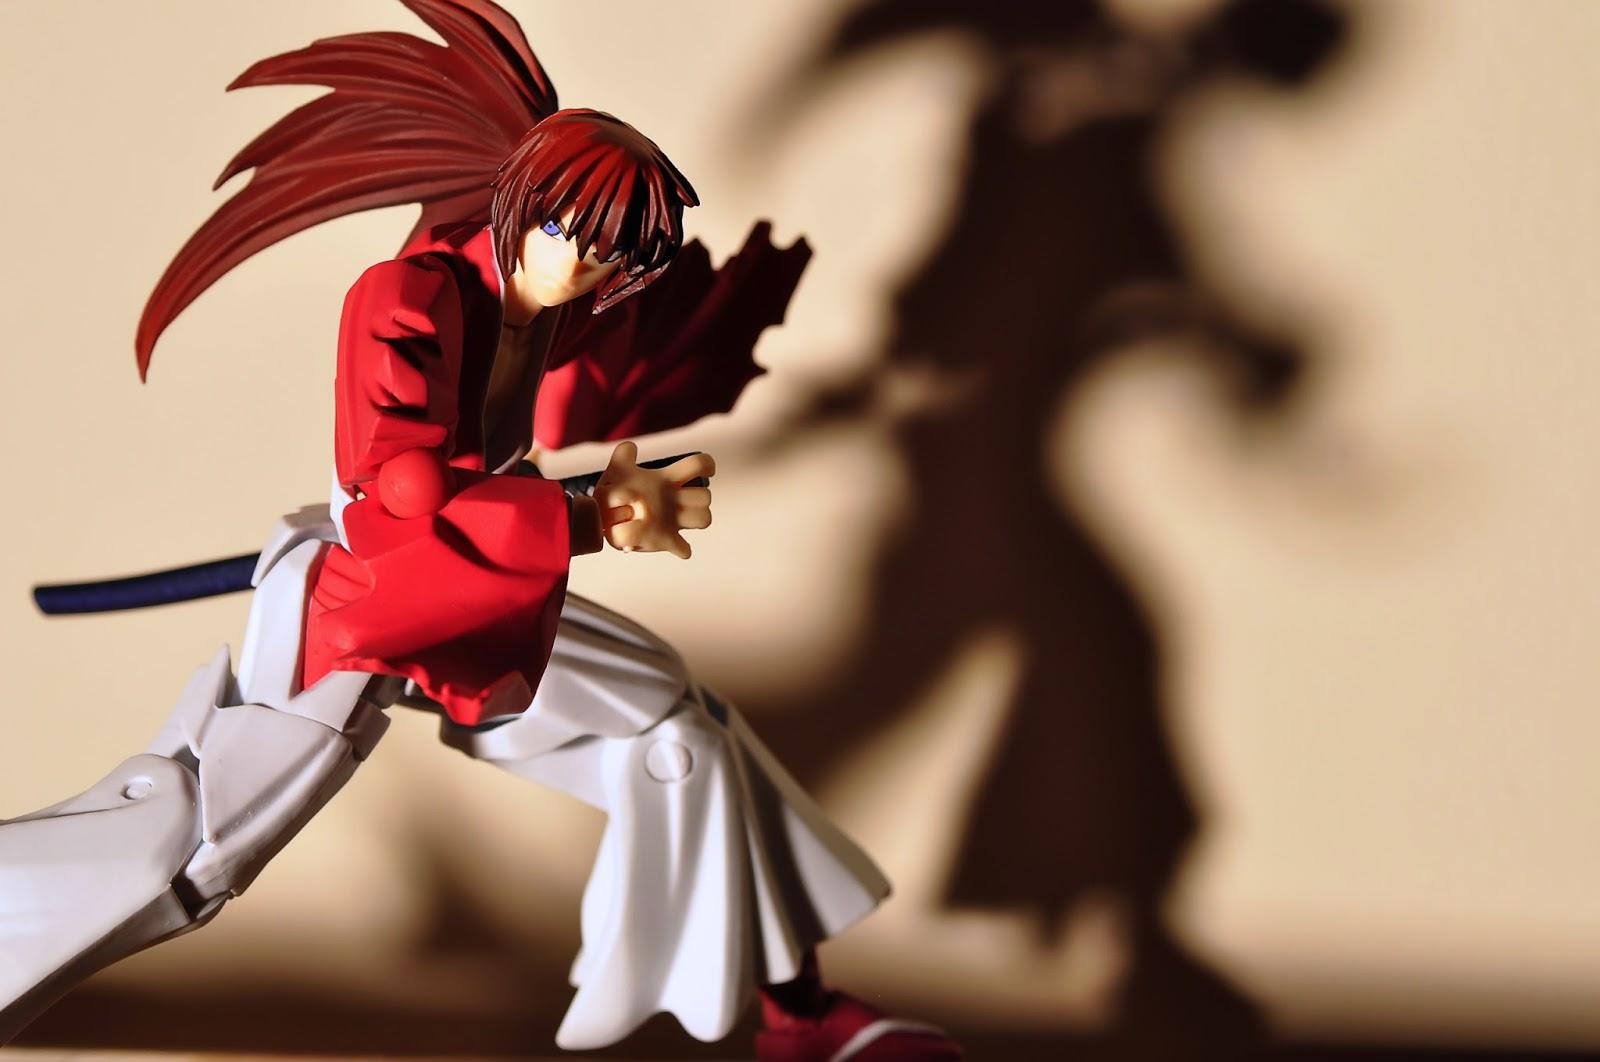 Rurouni Kenshin Samurai X HD Wallpaper